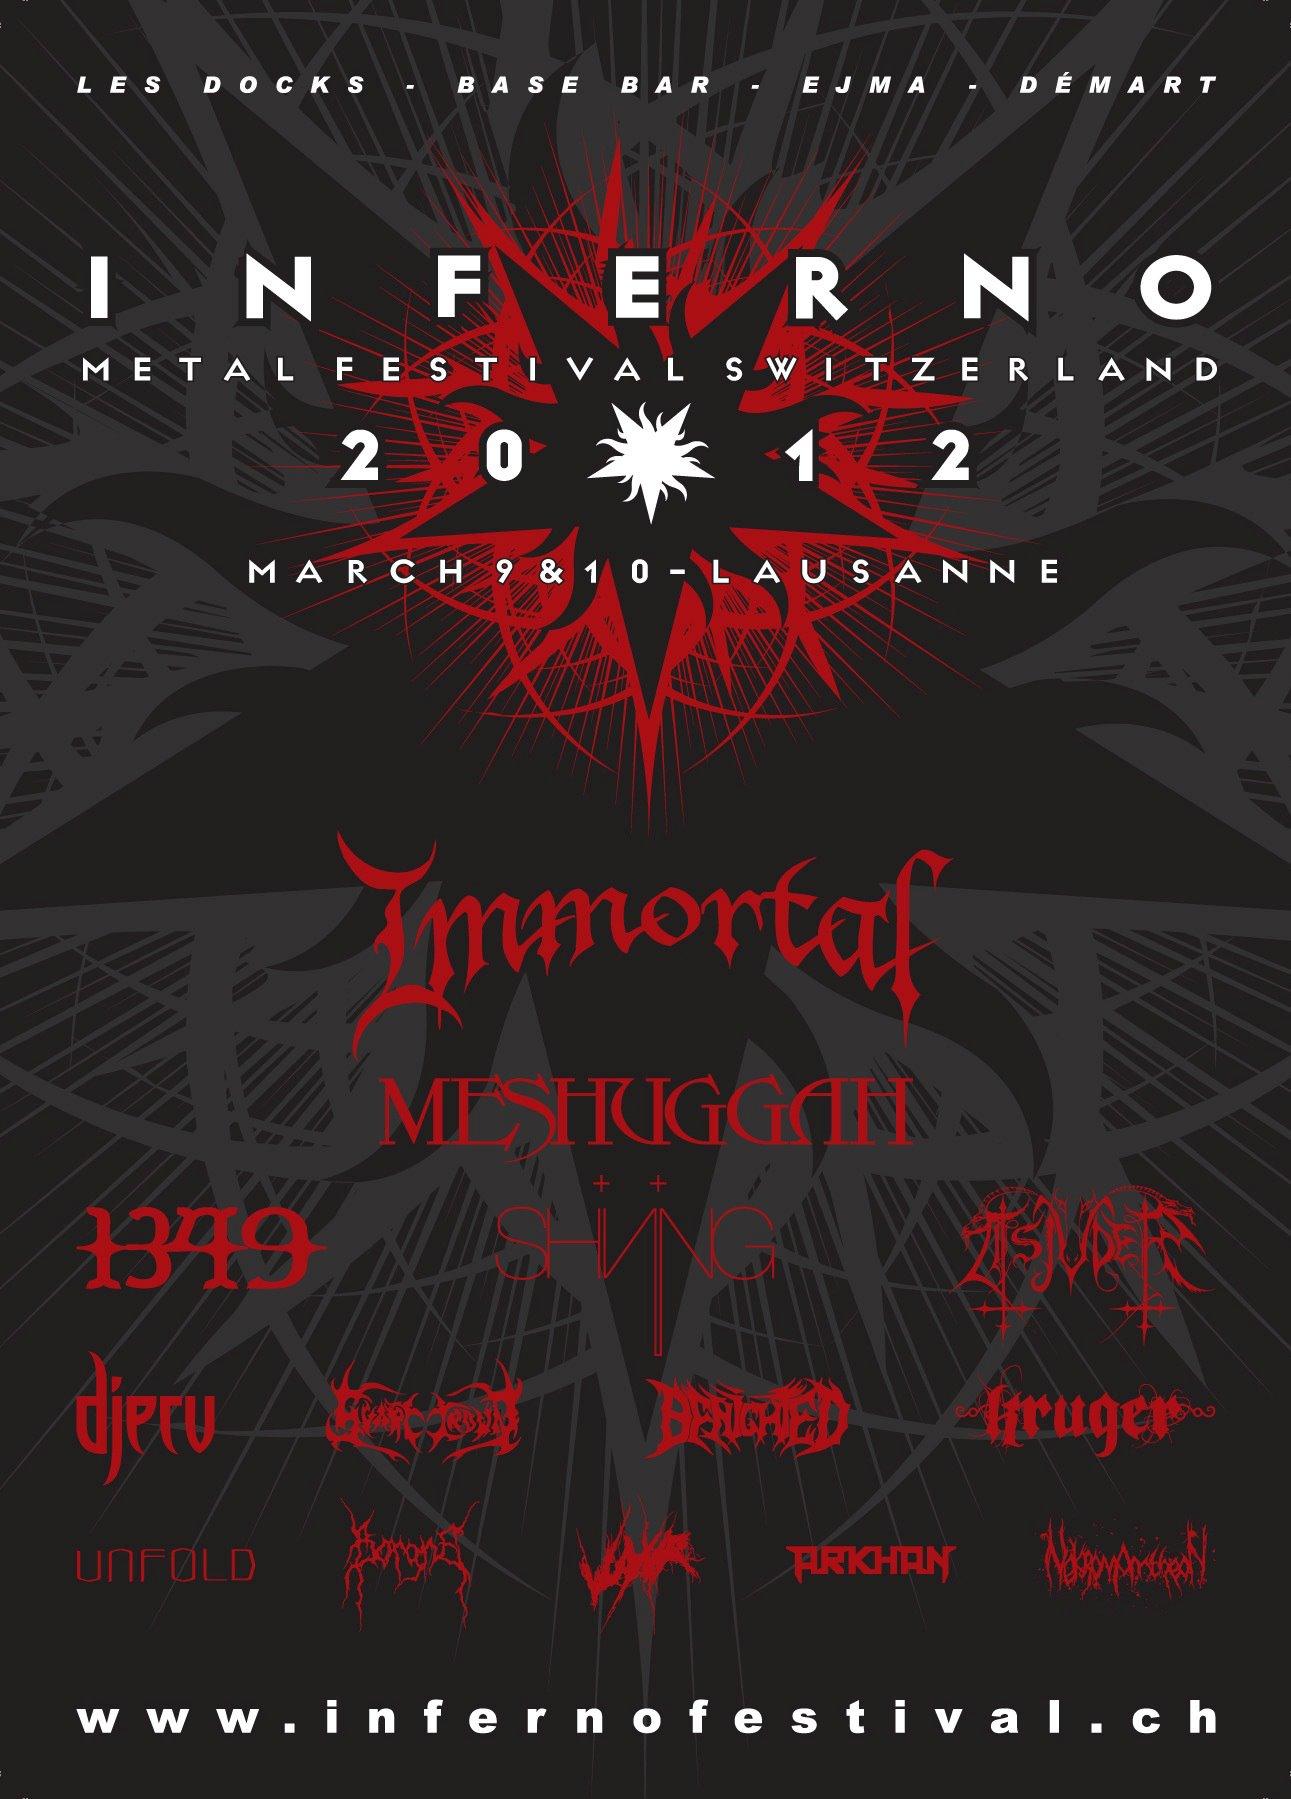 Inferno Festival 2012 Switzerland